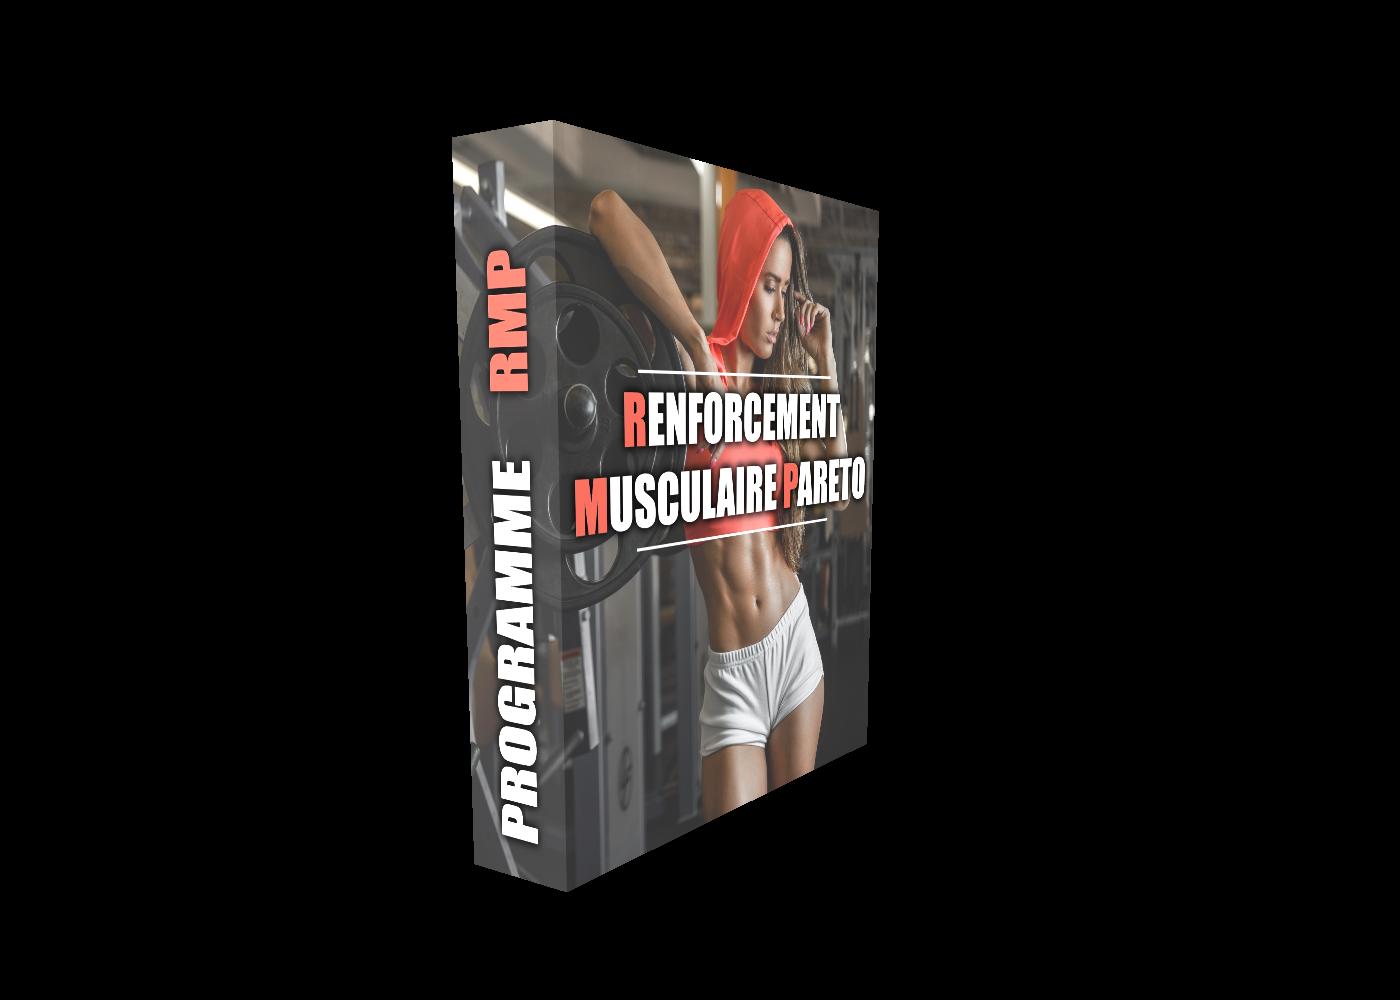 Programme vidéo renforcement musculaire musculation e-learning